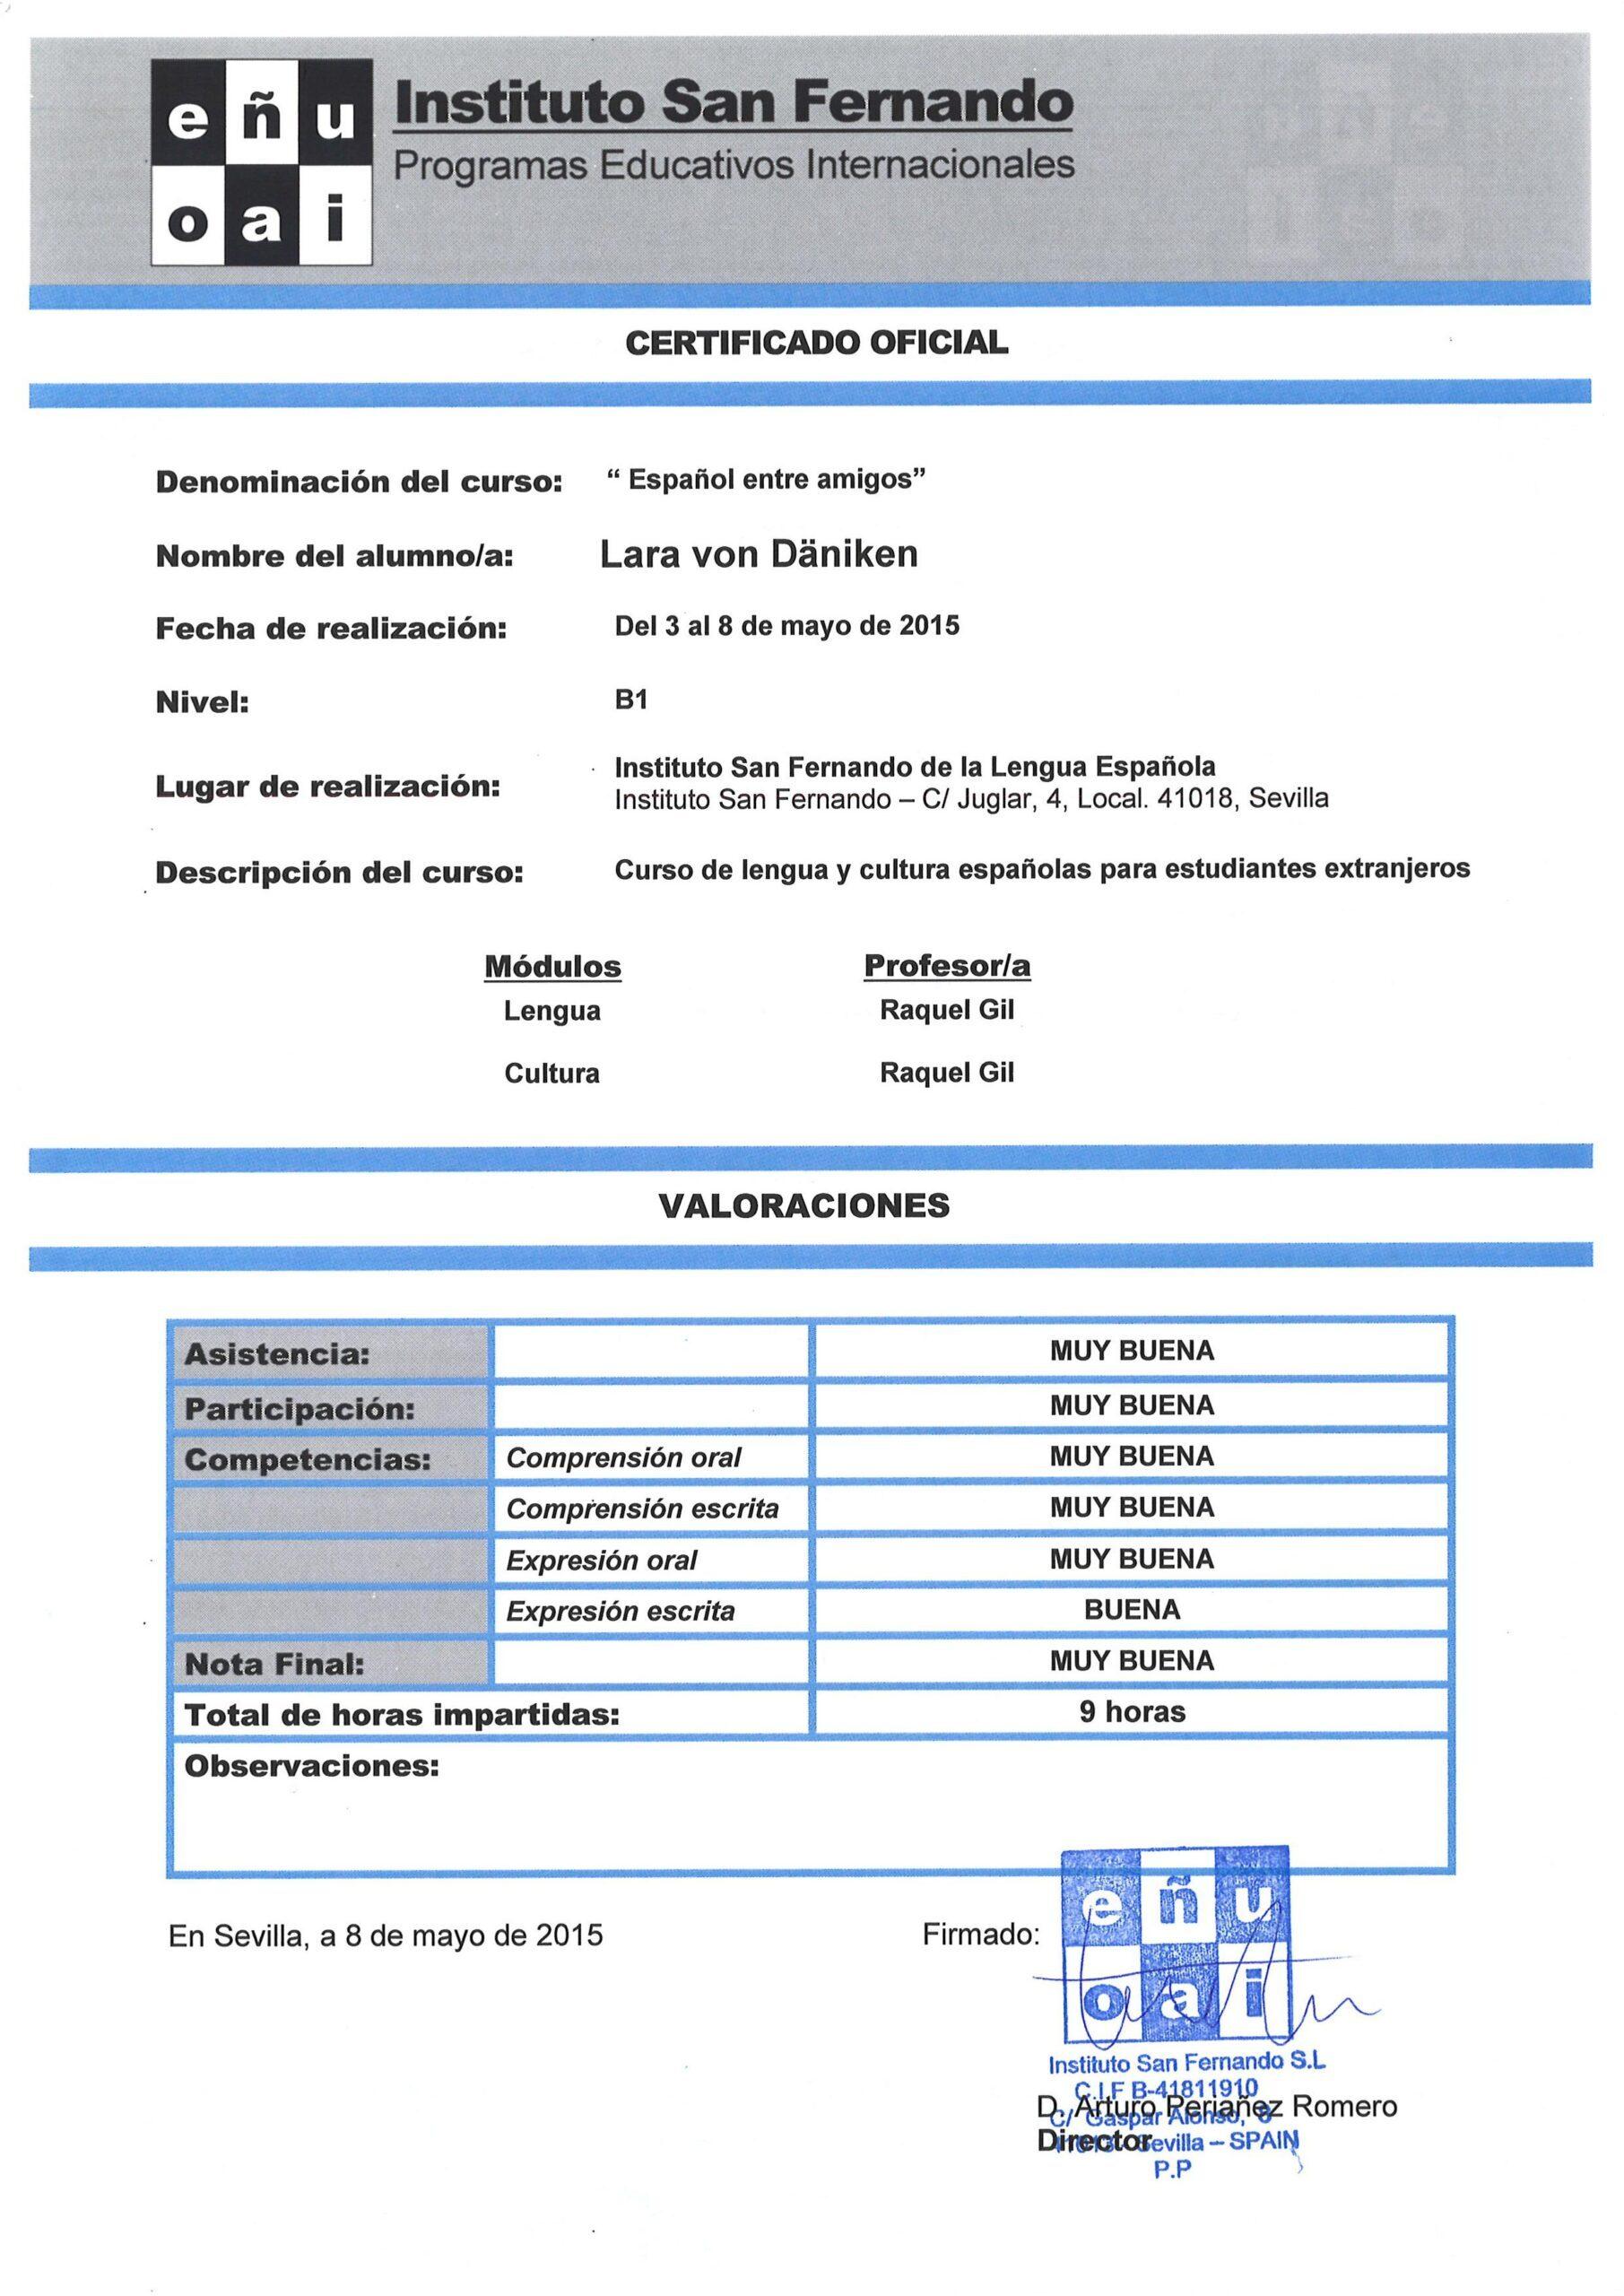 https://laravondaeniken.com/wp-content/uploads/2020/06/Certificado-Instituto-San-Fernando_1-scaled-1811x2560.jpg